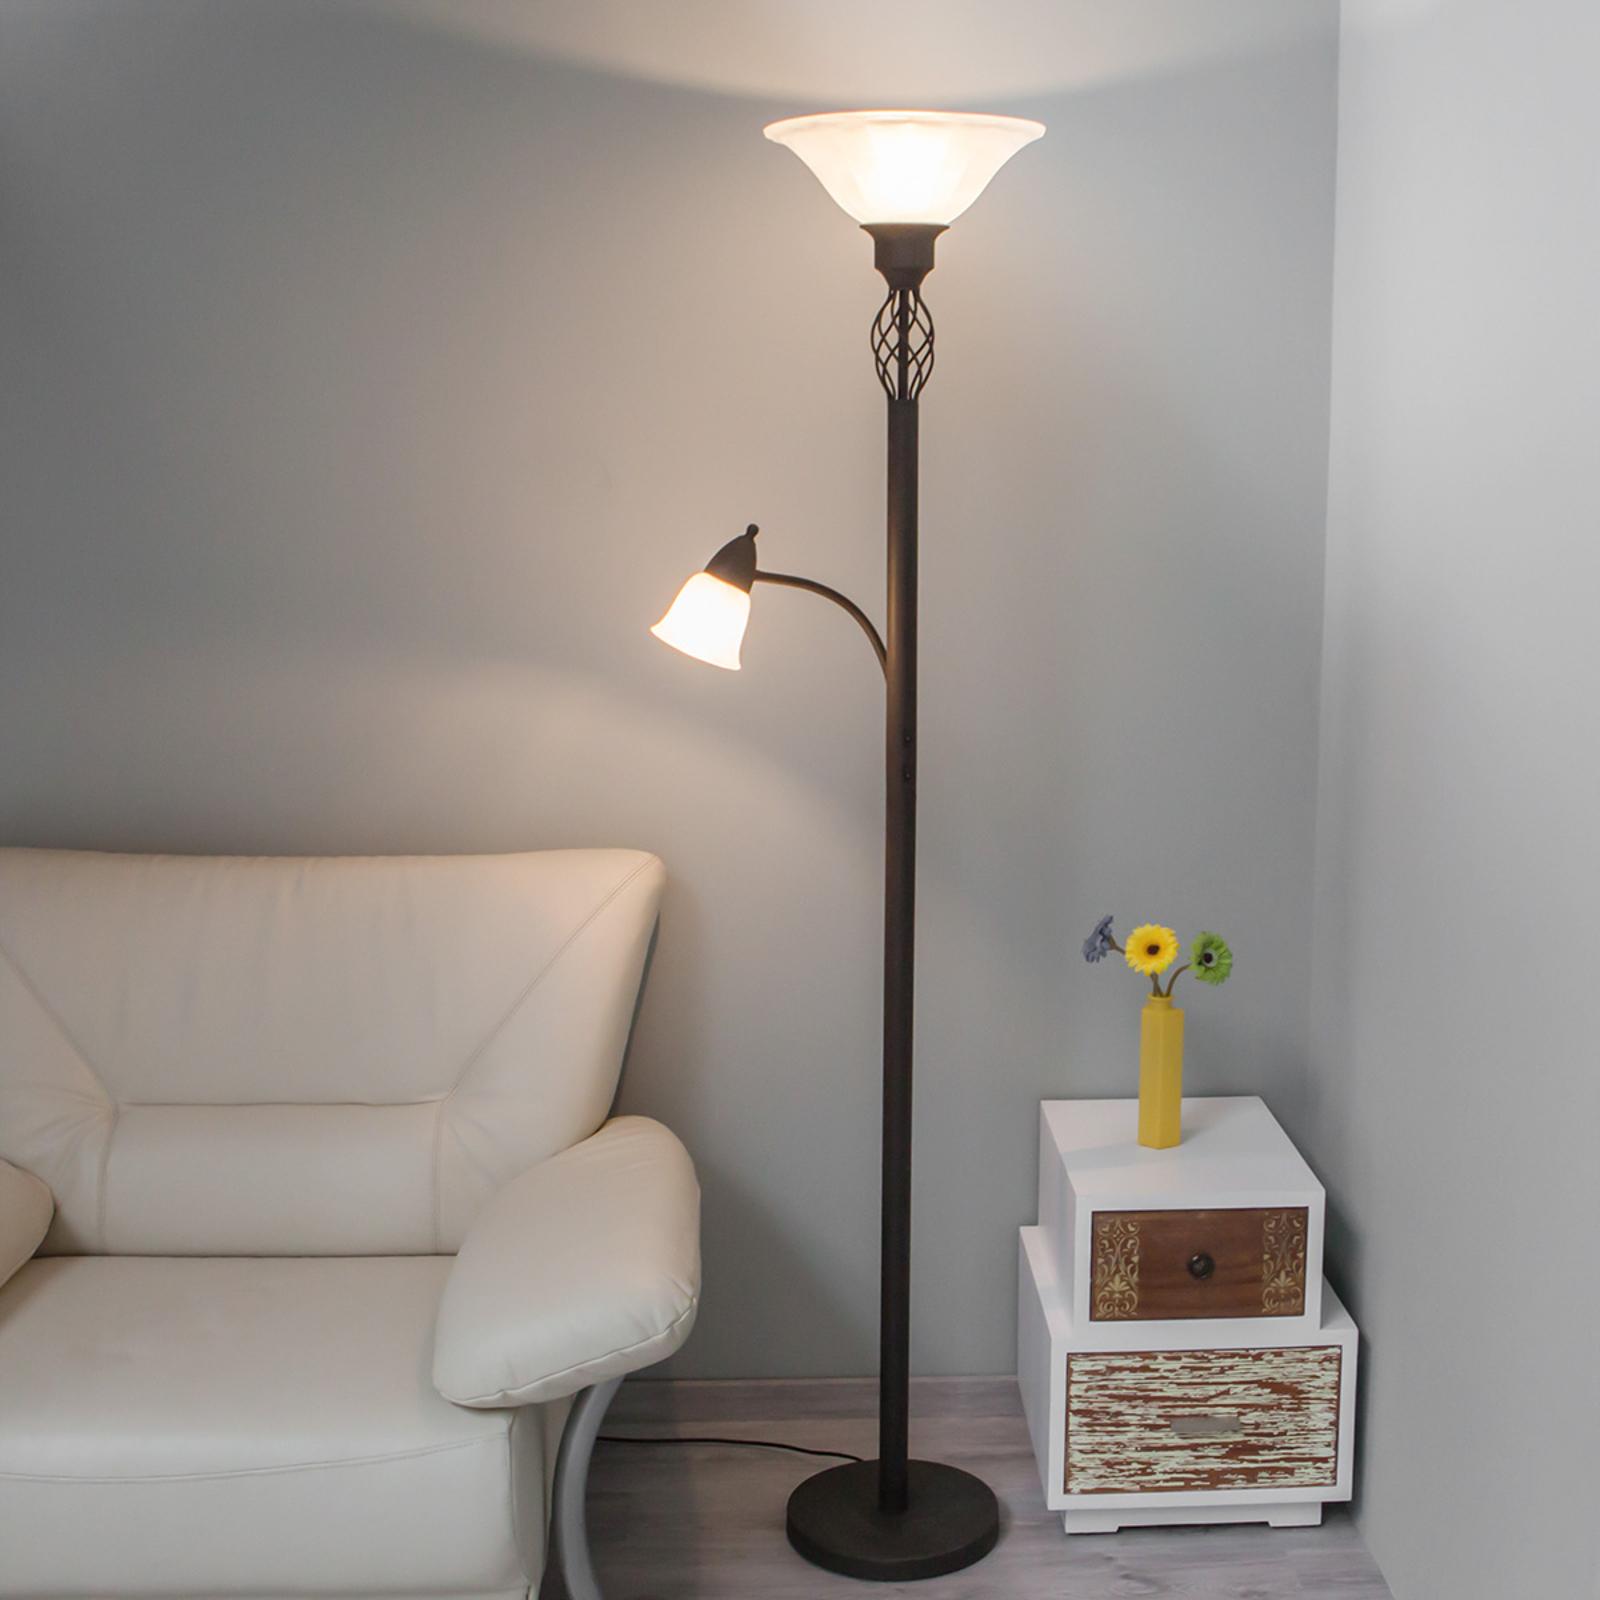 Lampa ośw. sufit LED DUNJA z lampką do czyt.